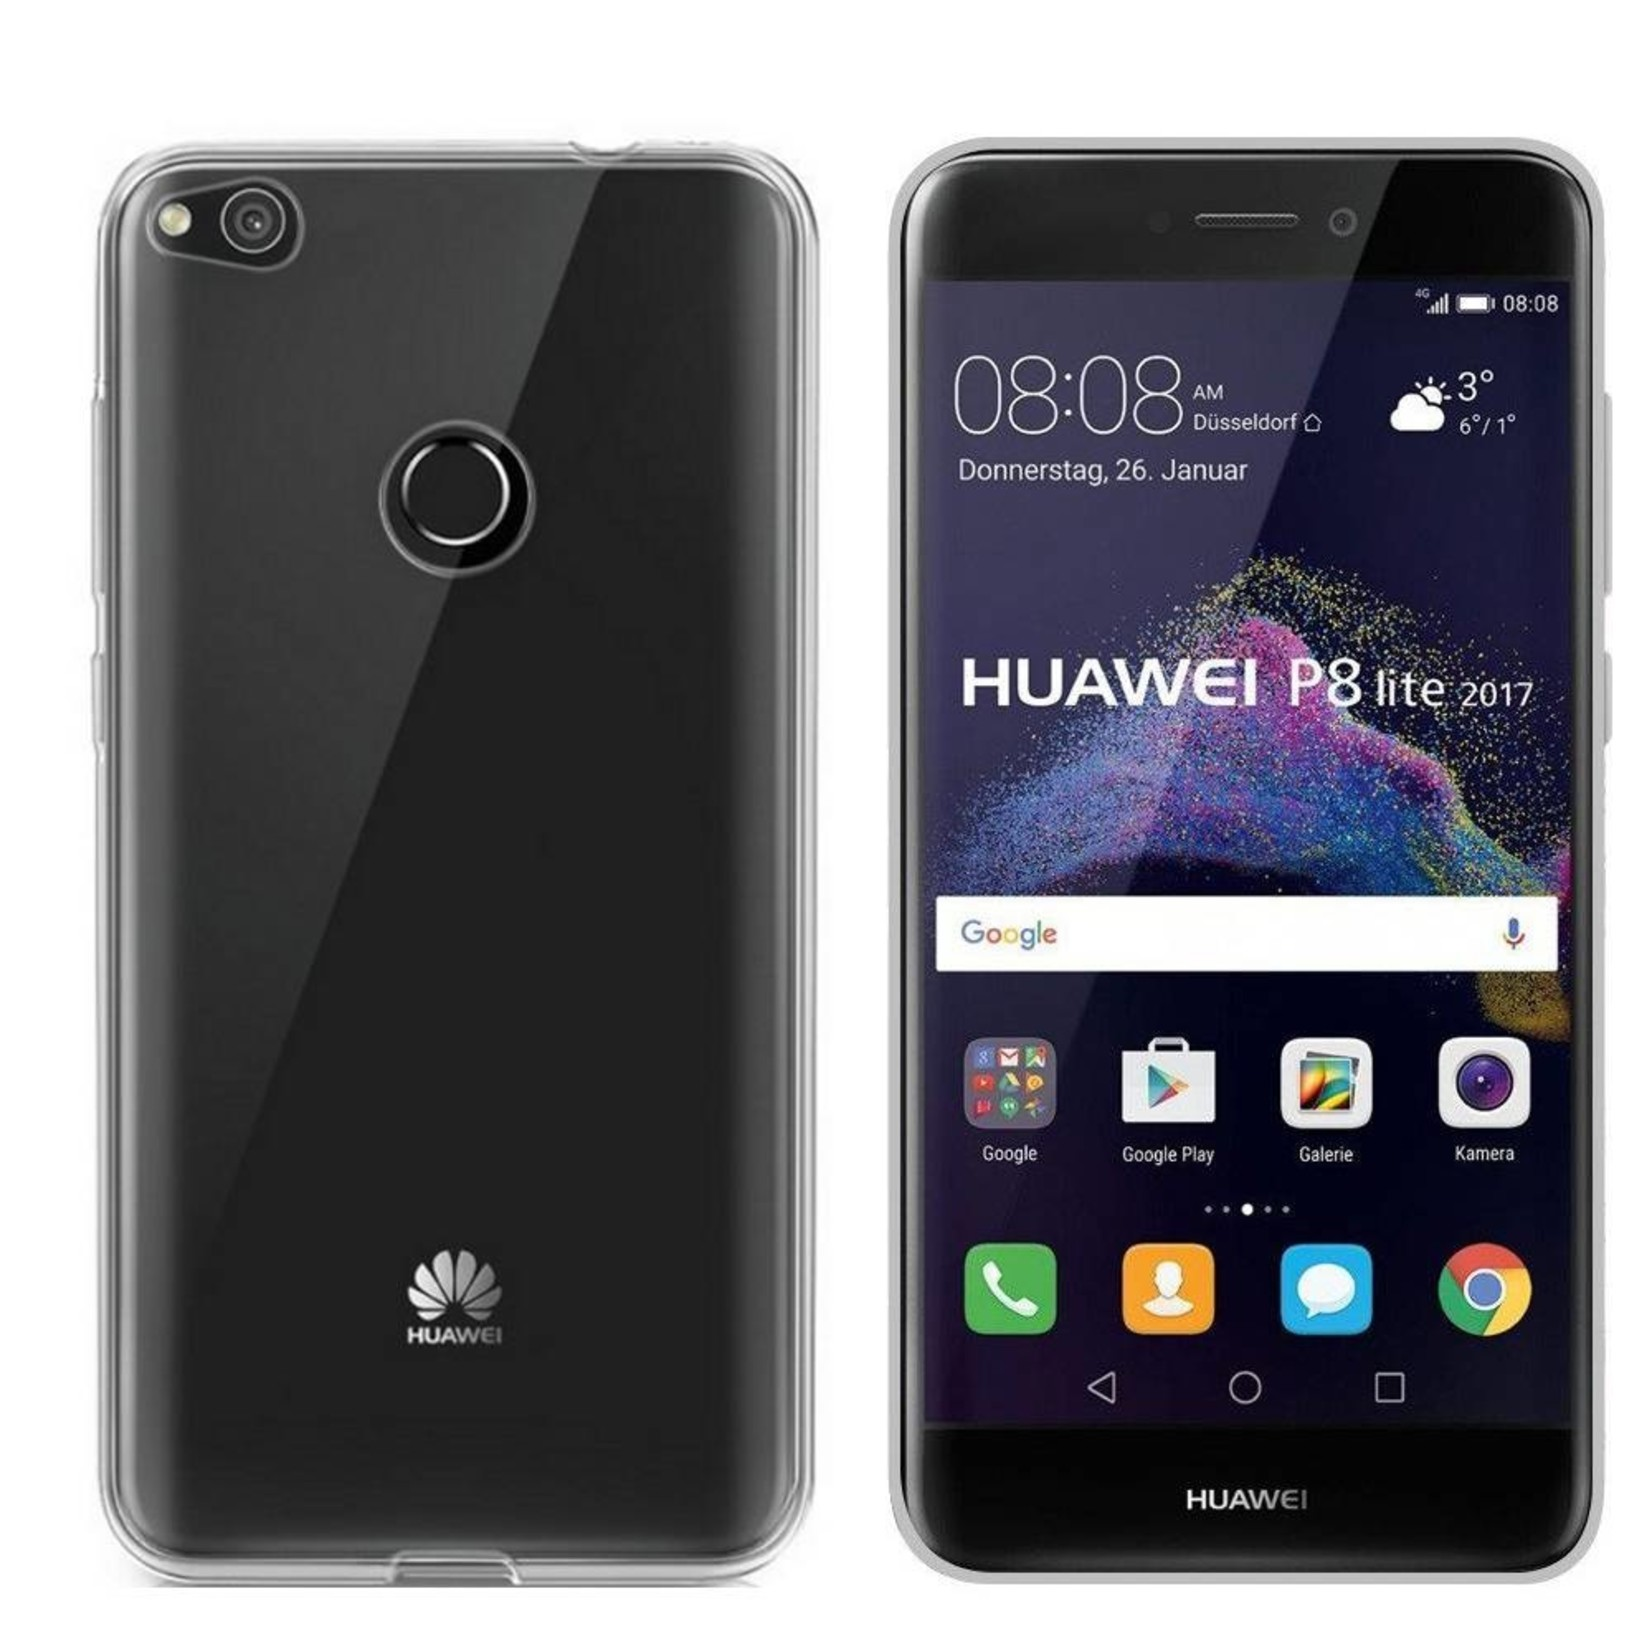 Colorfone Hoesje CoolSkin3T voor Huawei P8 Lite 2017 Tr. Wit